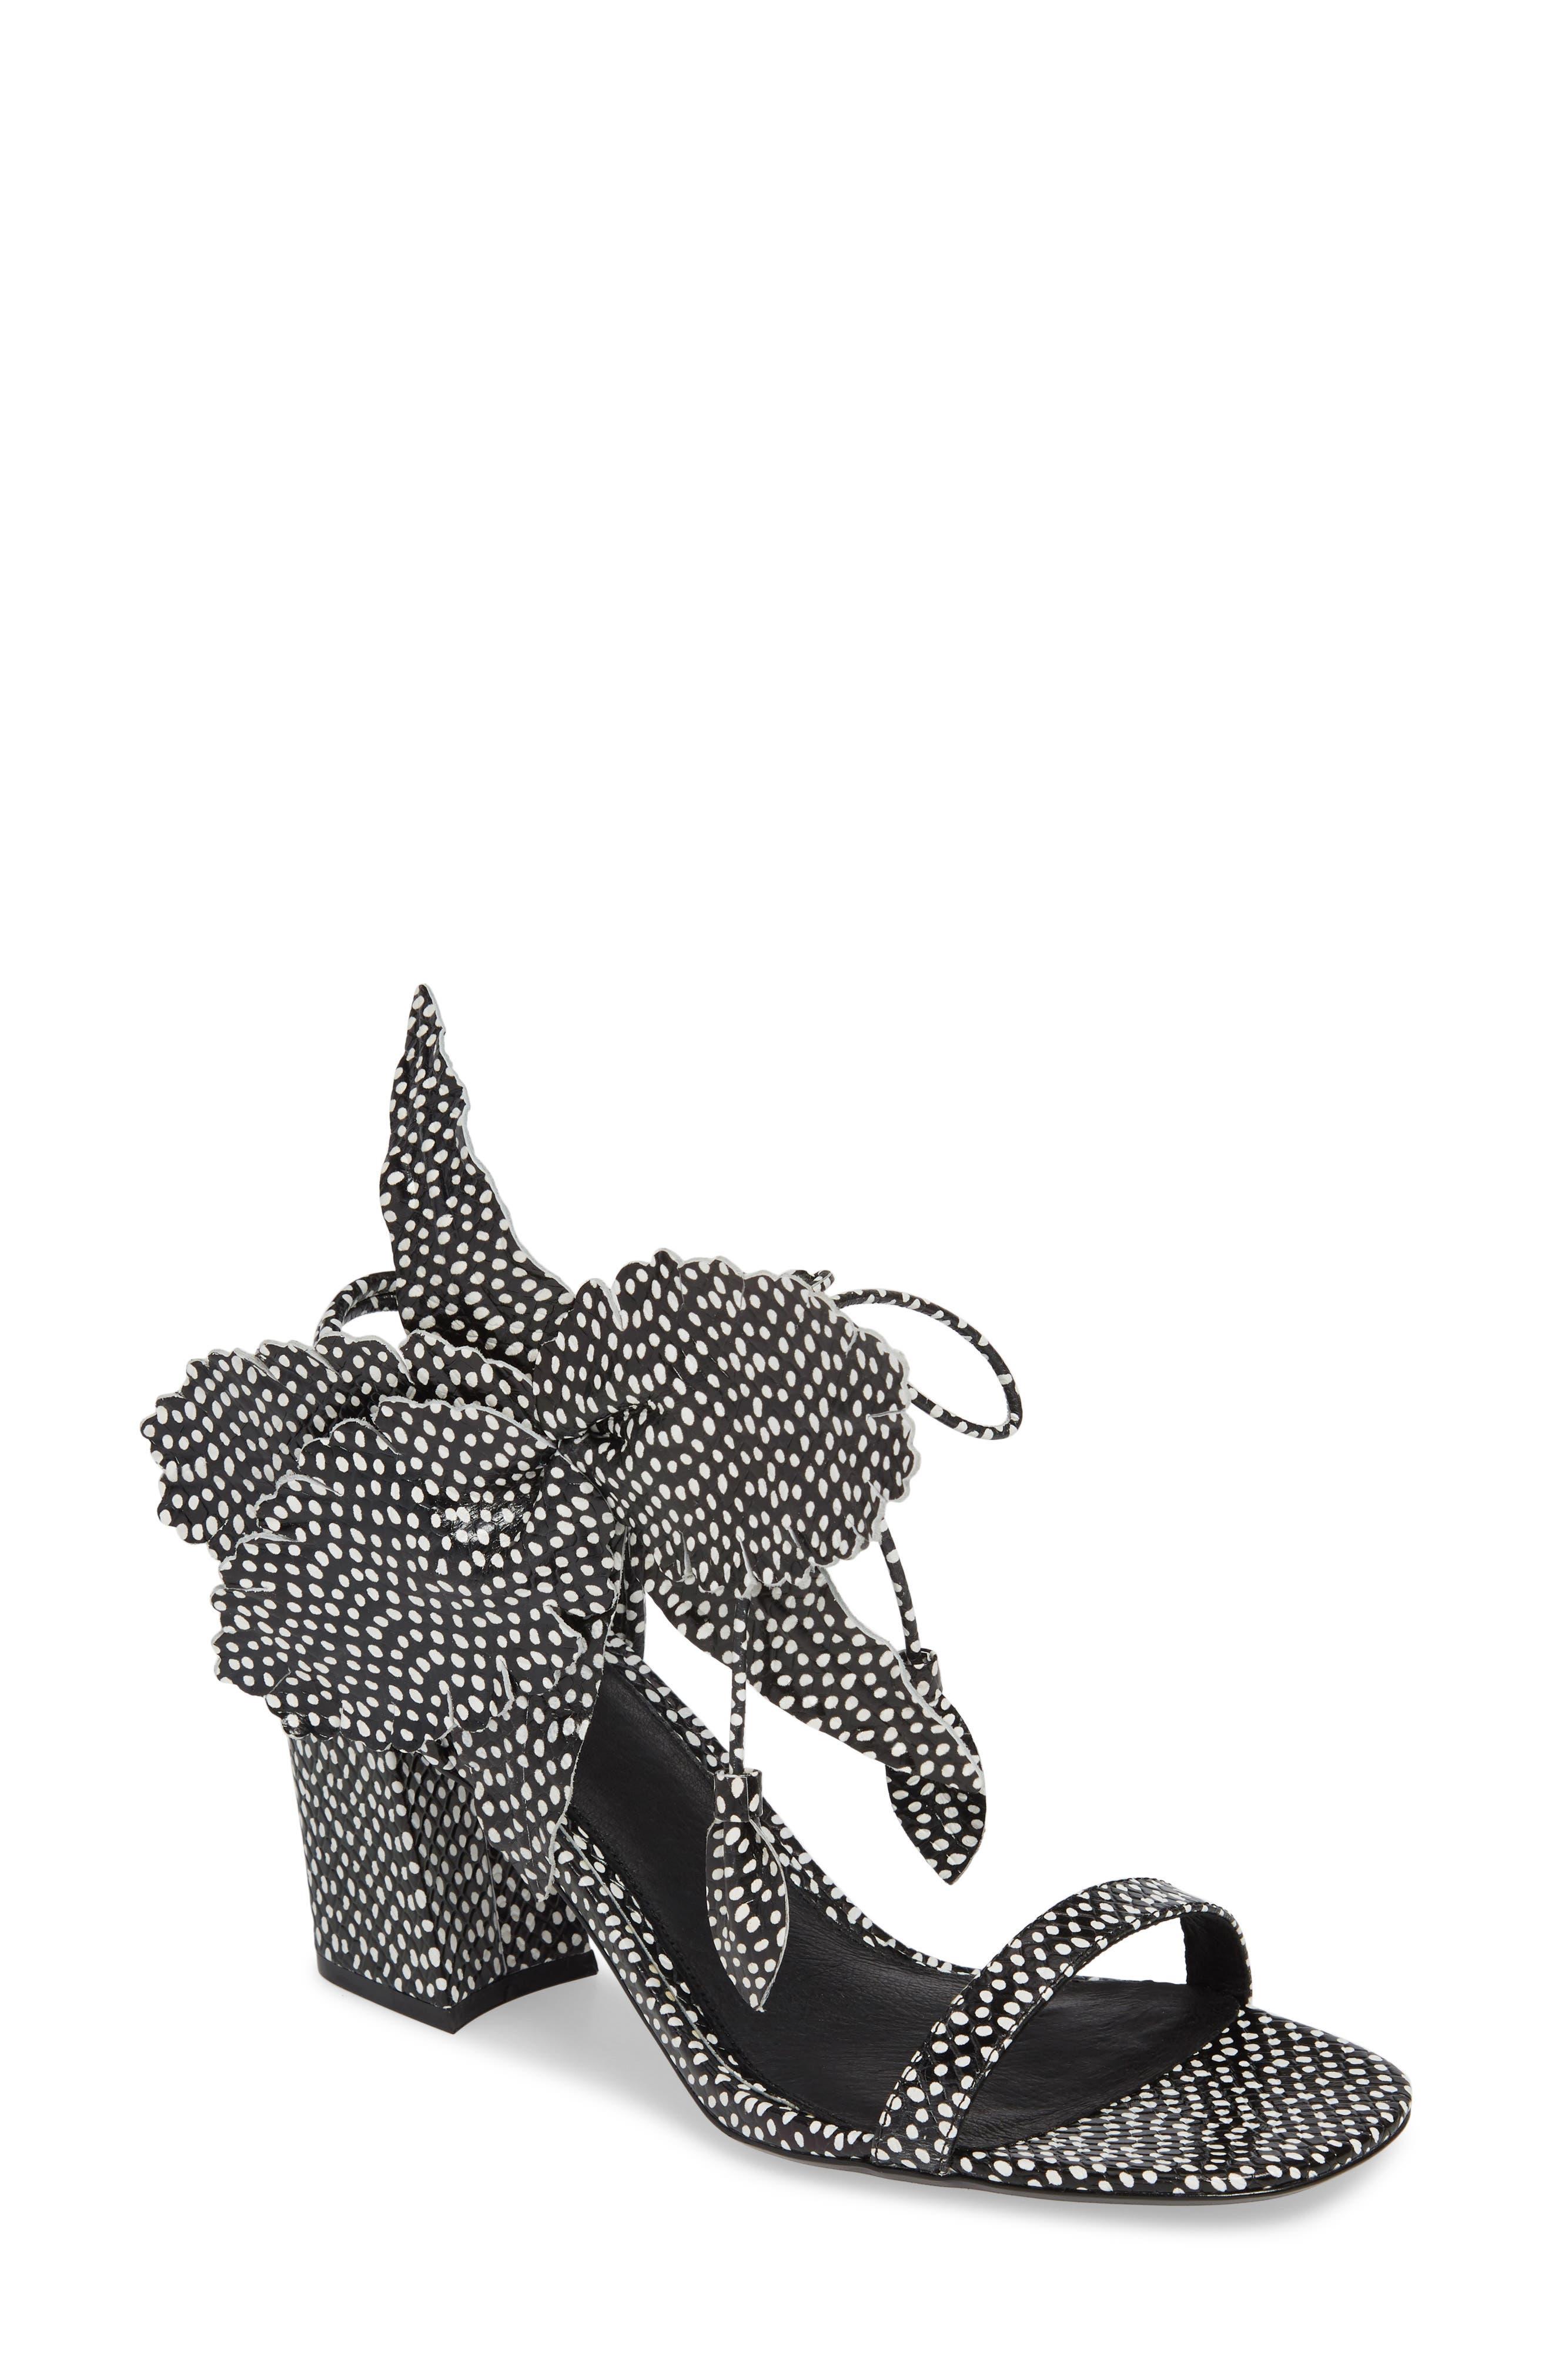 CECELIA NEW YORK, Hibiscus Sandal, Main thumbnail 1, color, BLACK AND WHITE DOT